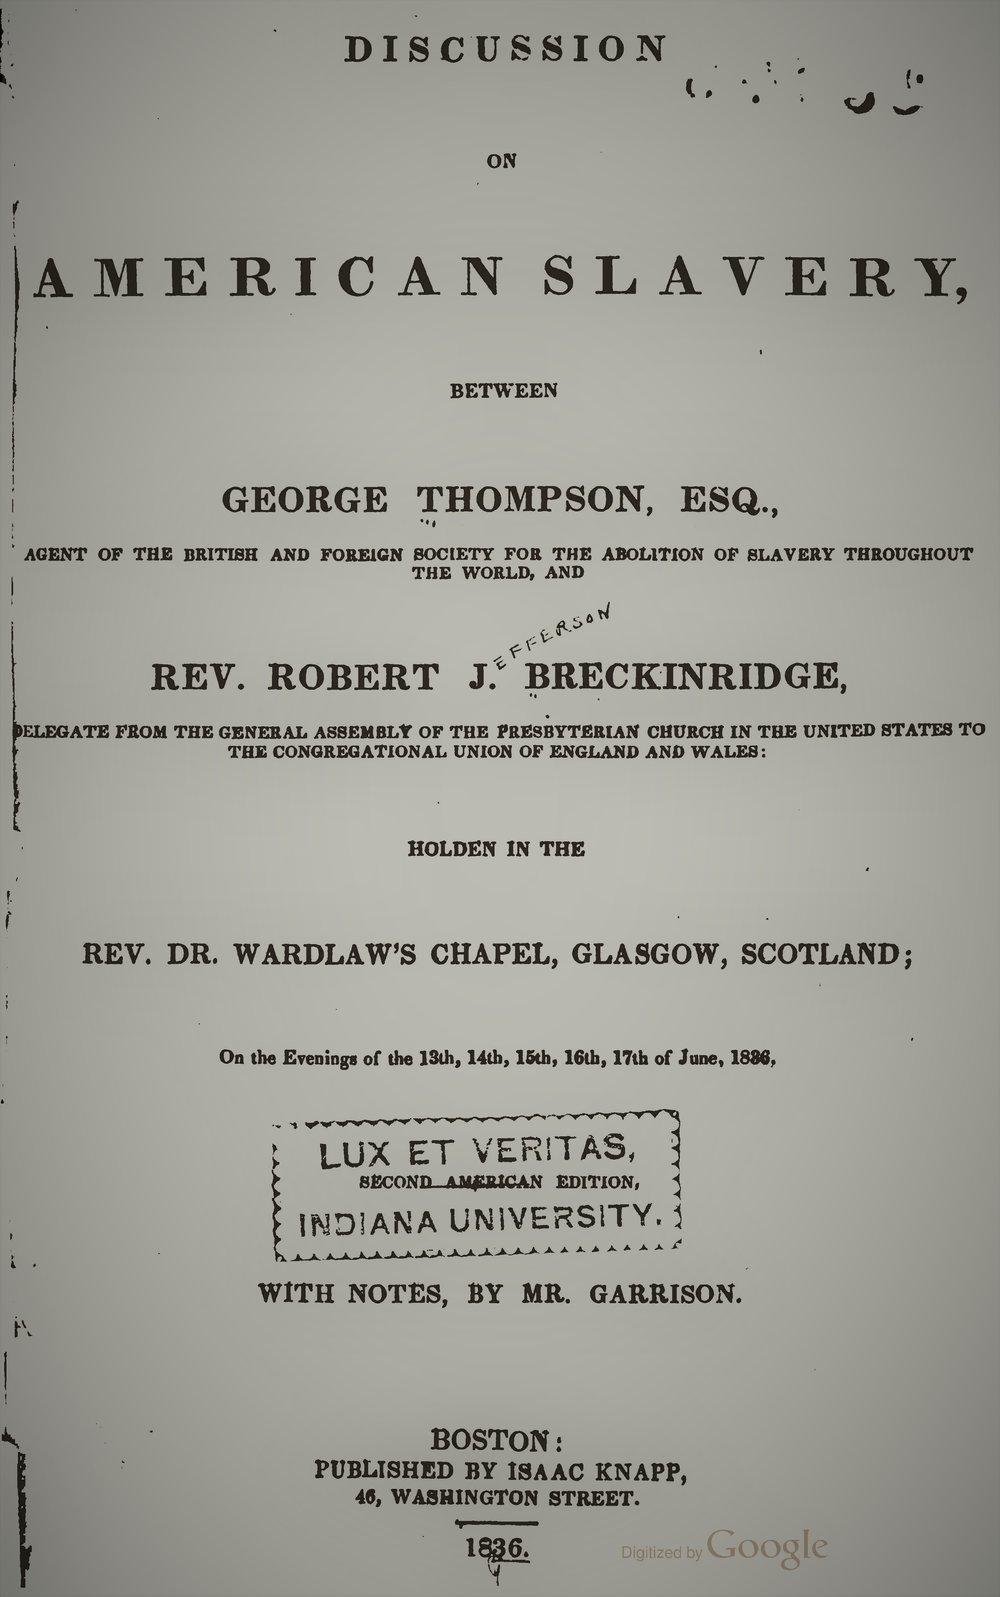 Breckinridge, Robert - Discussion of American Slavery.jpg